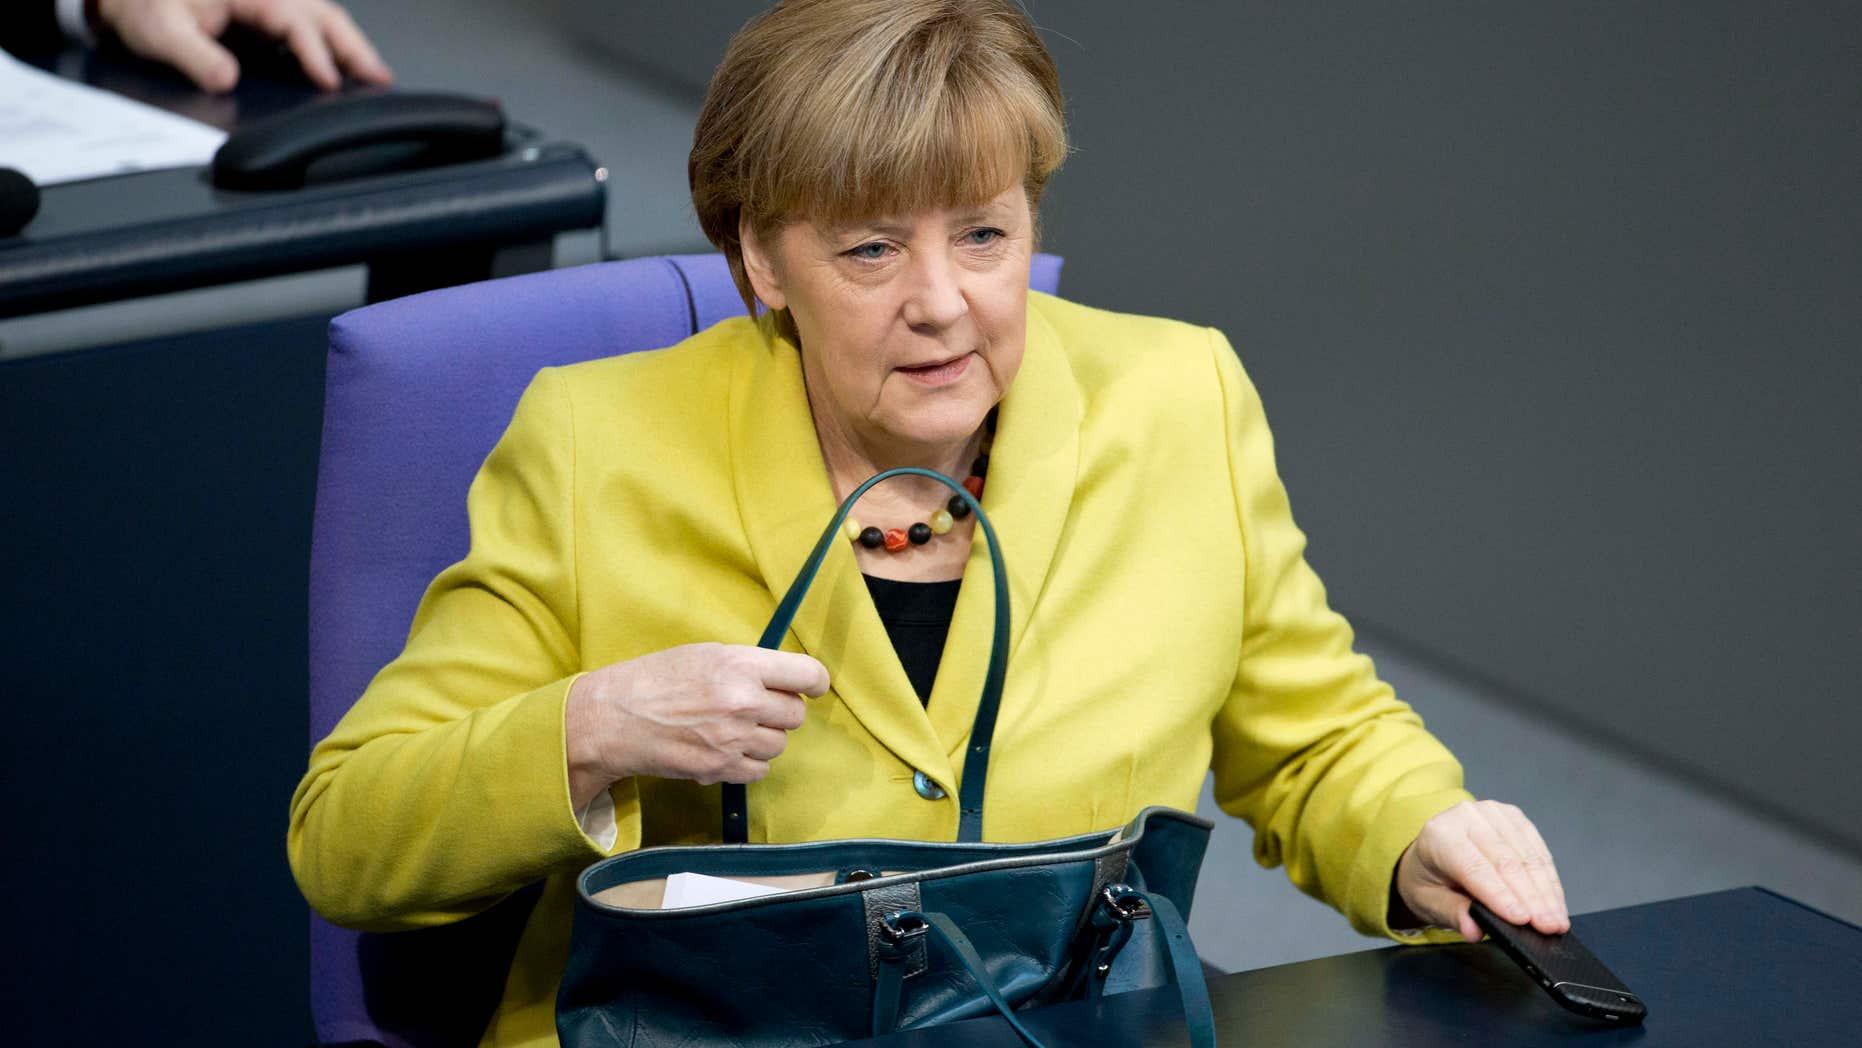 Feb. 27, 2015: German Chancellor Angela Merkel arrives for a debate at the German parliament, the Bundestag in Berlin.